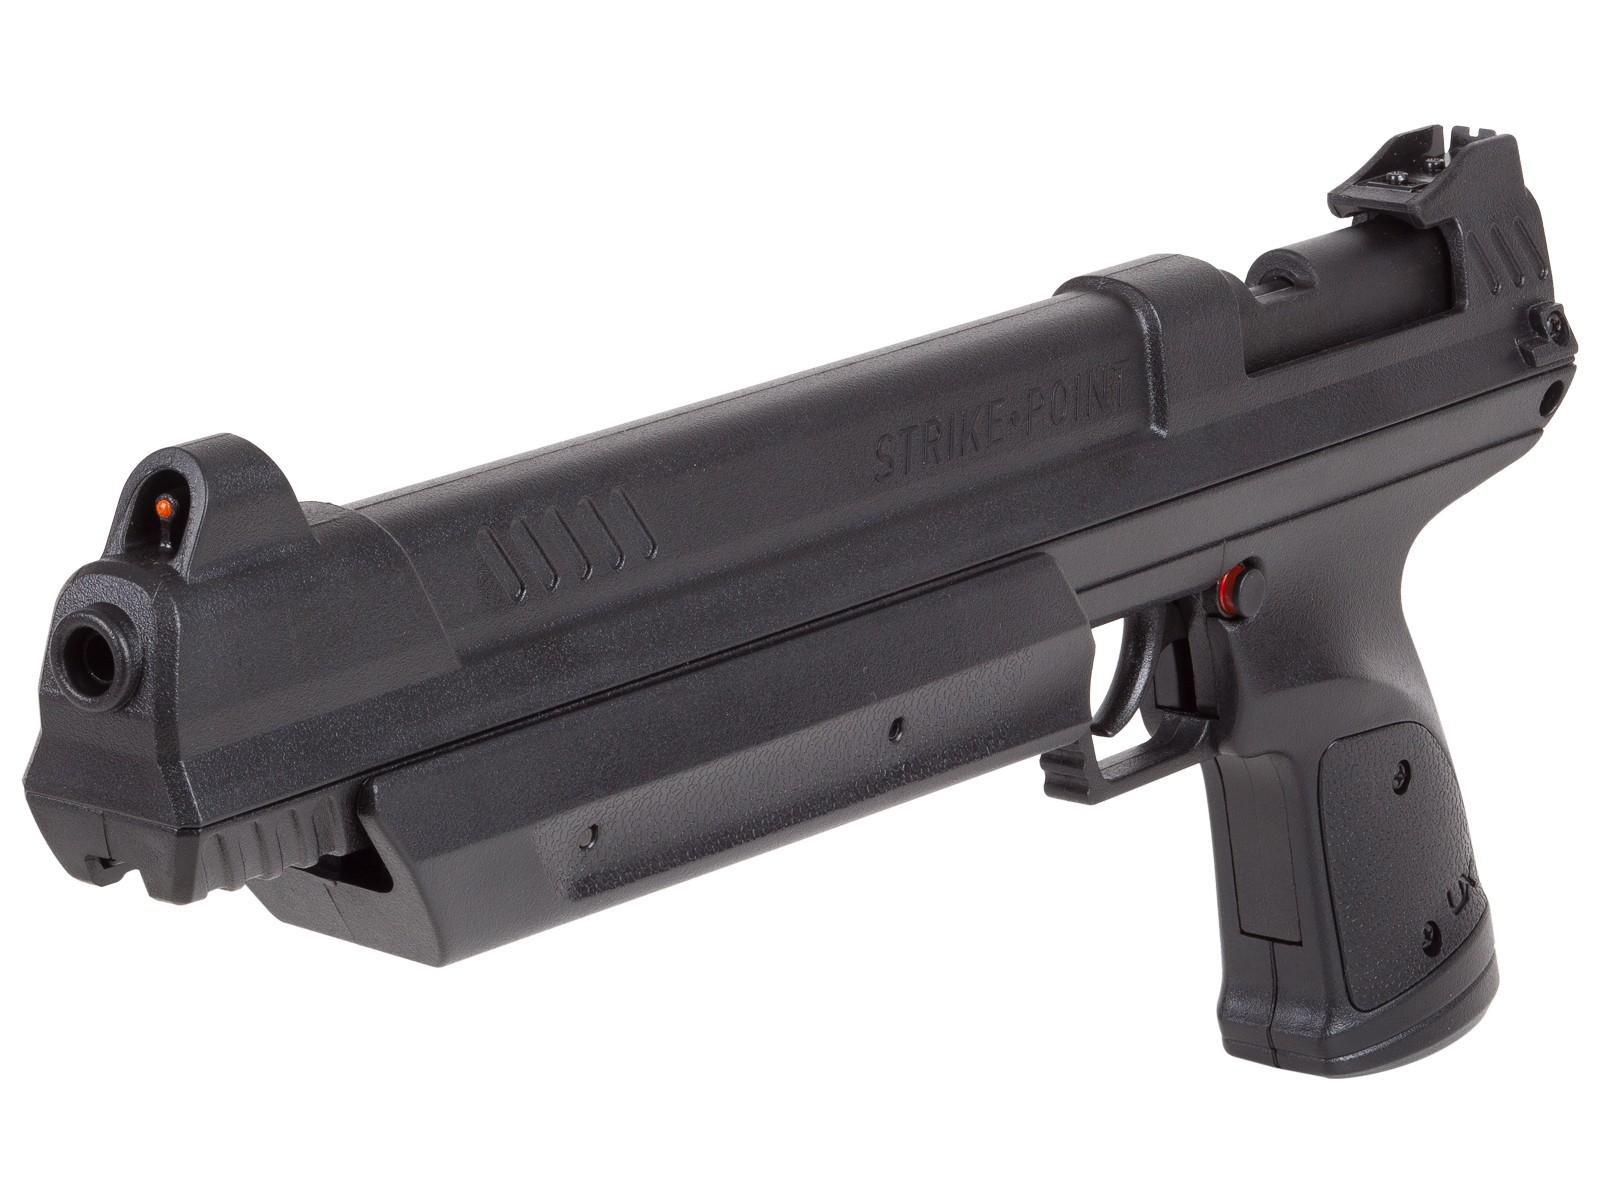 Umarex Strike Point Pellet Multi-Pump Air Pistol